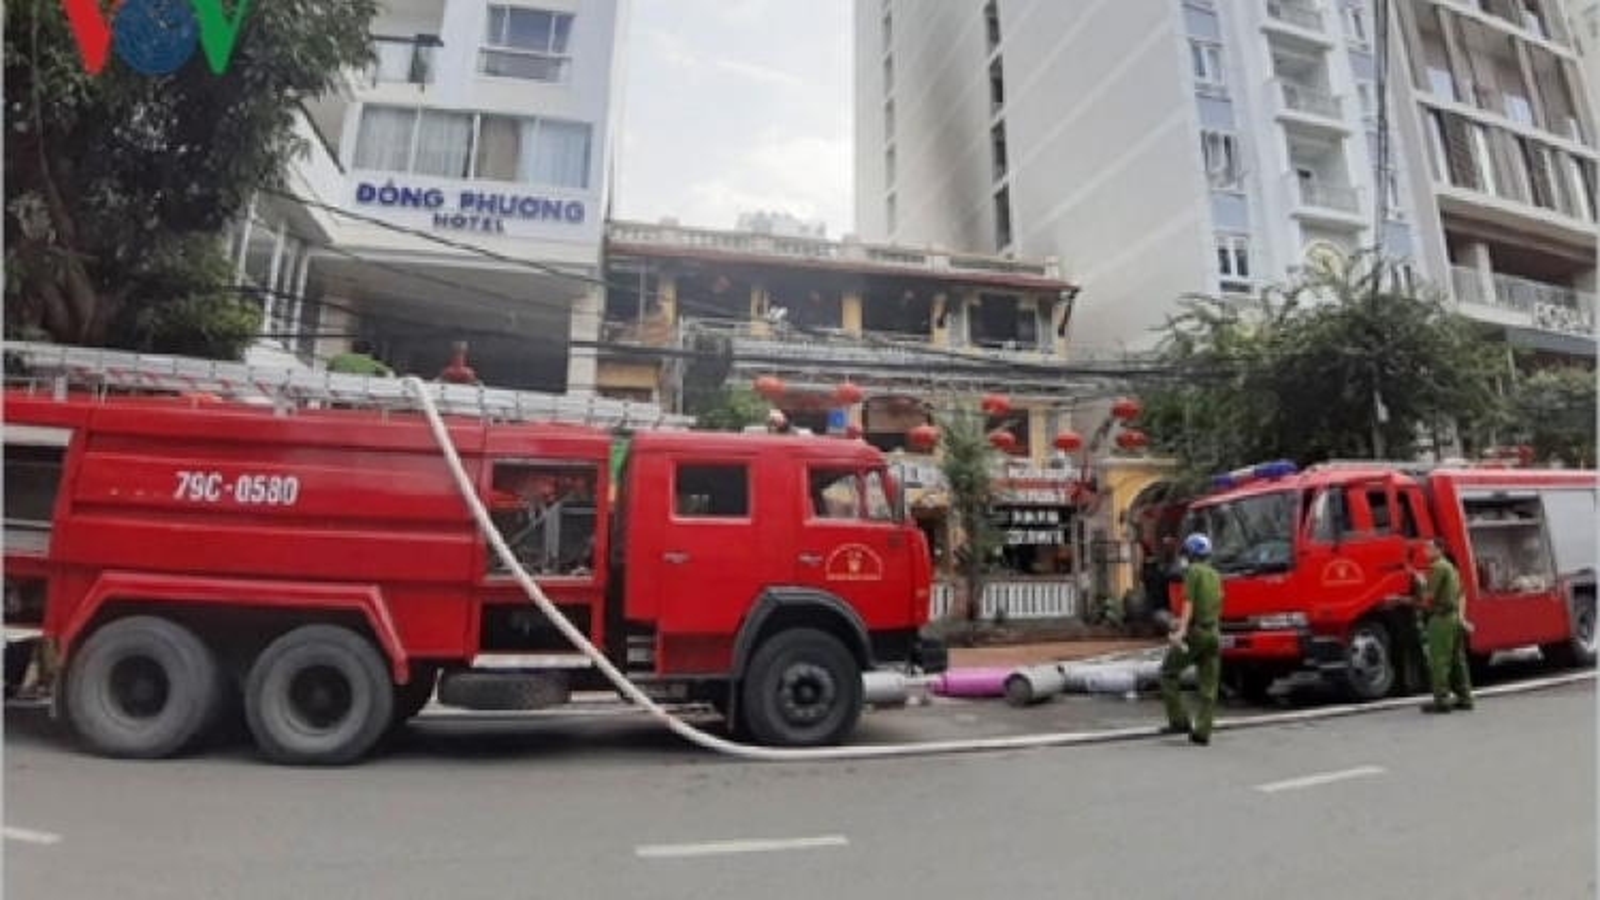 Fire engulfs restaurant in Nha Trang